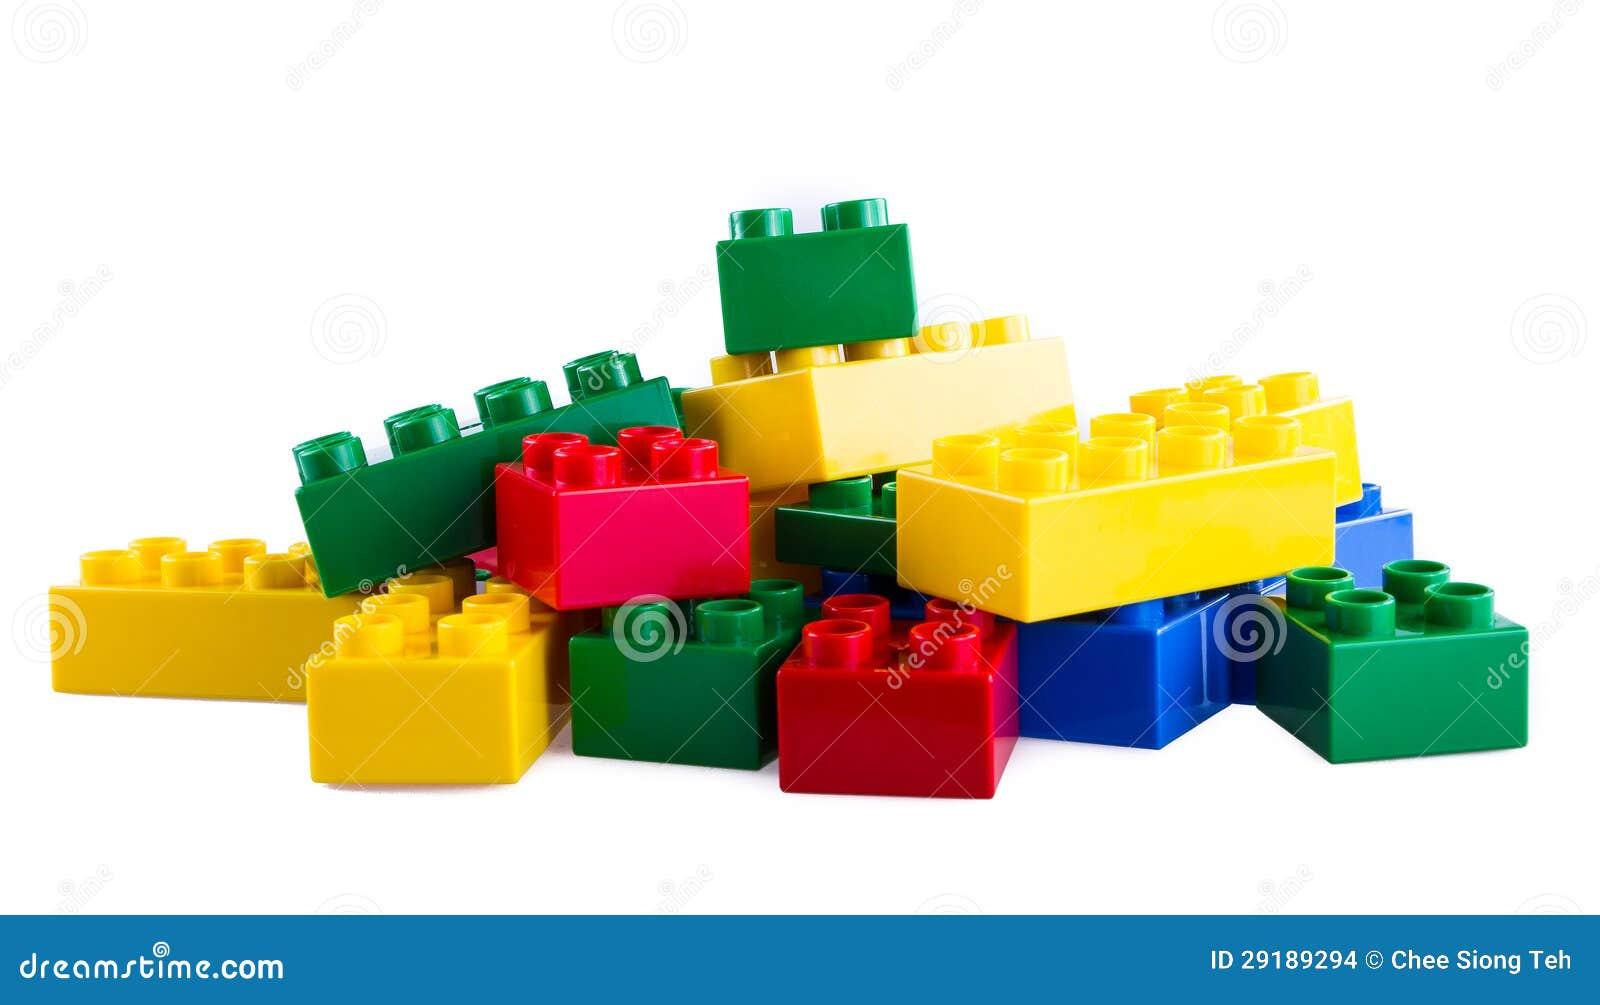 lego bausteine stock images - 216 photos